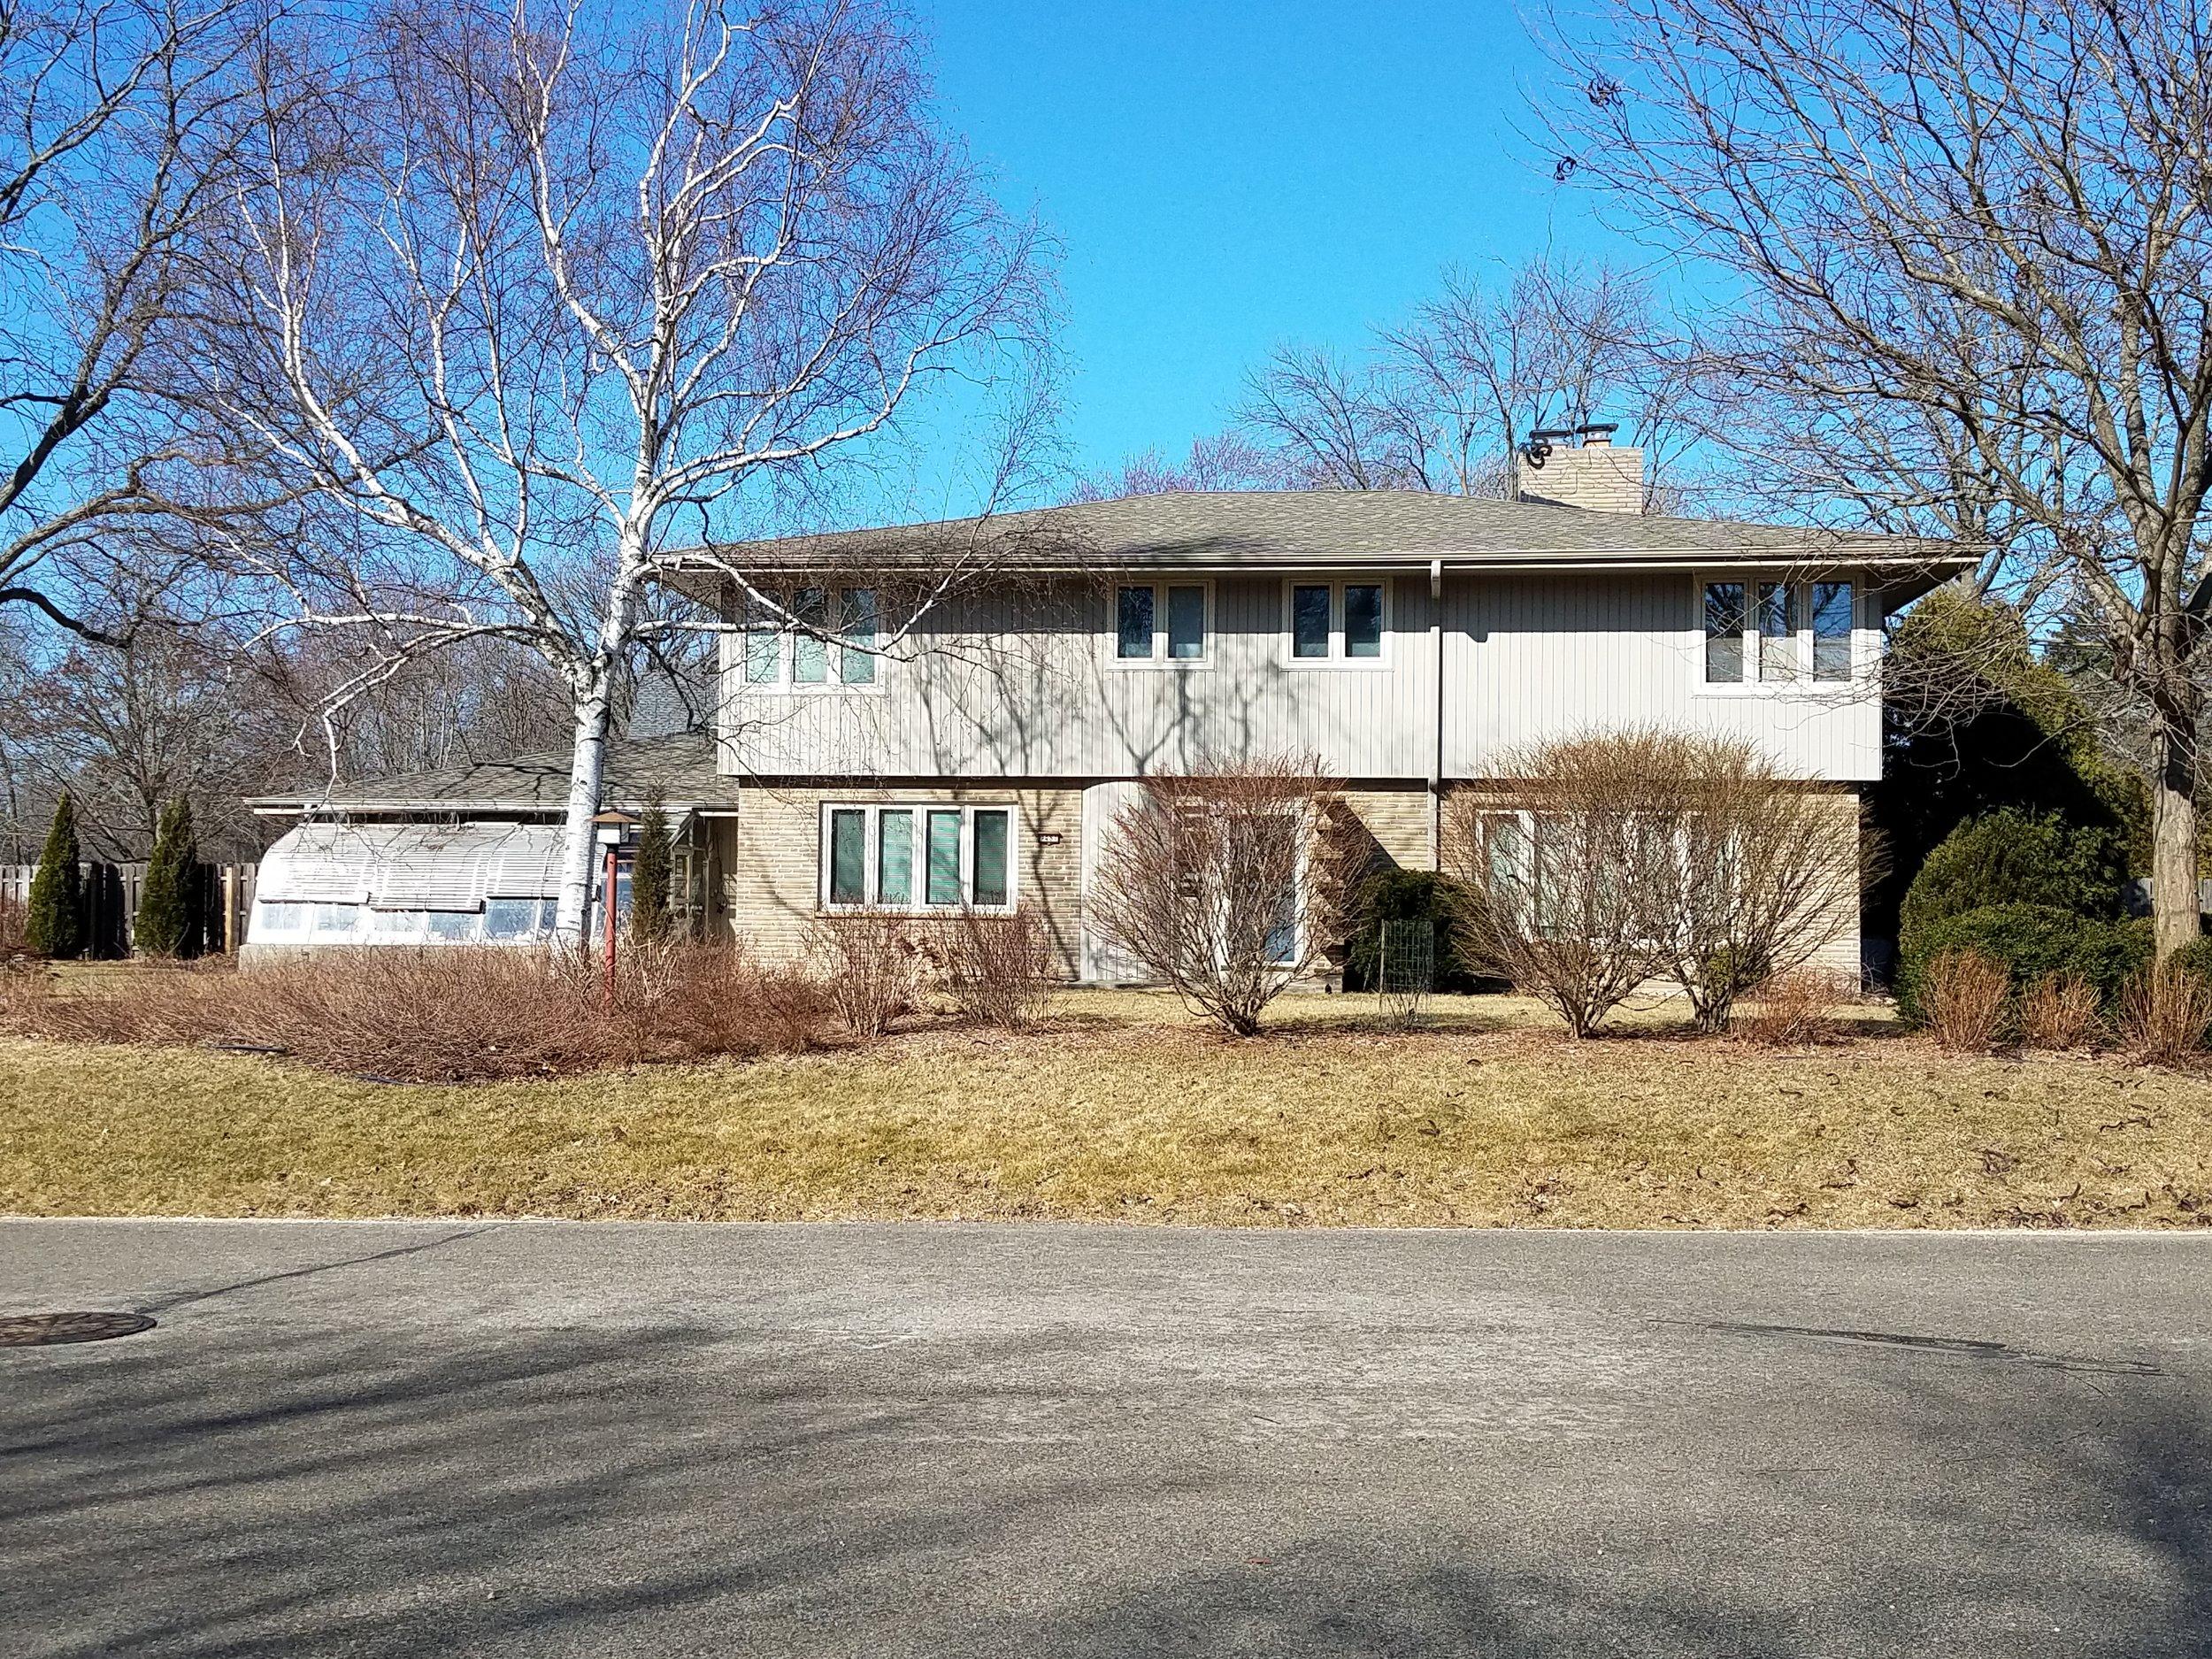 House in Wisconsin I grew up in